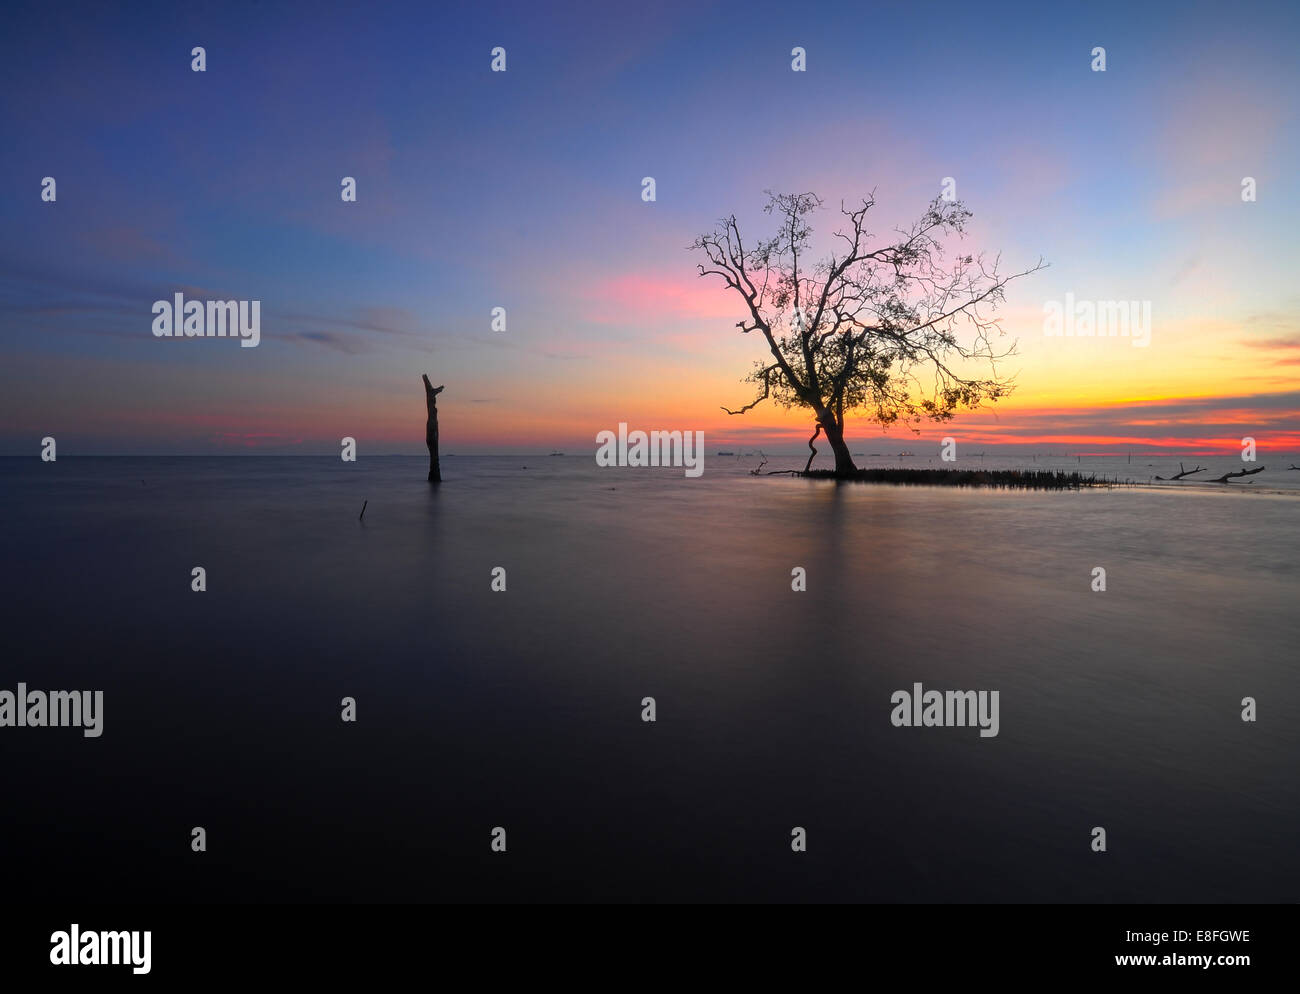 Malaysia, Selangor, Banting, singolo albero Kelanang sulla spiaggia al tramonto Immagini Stock